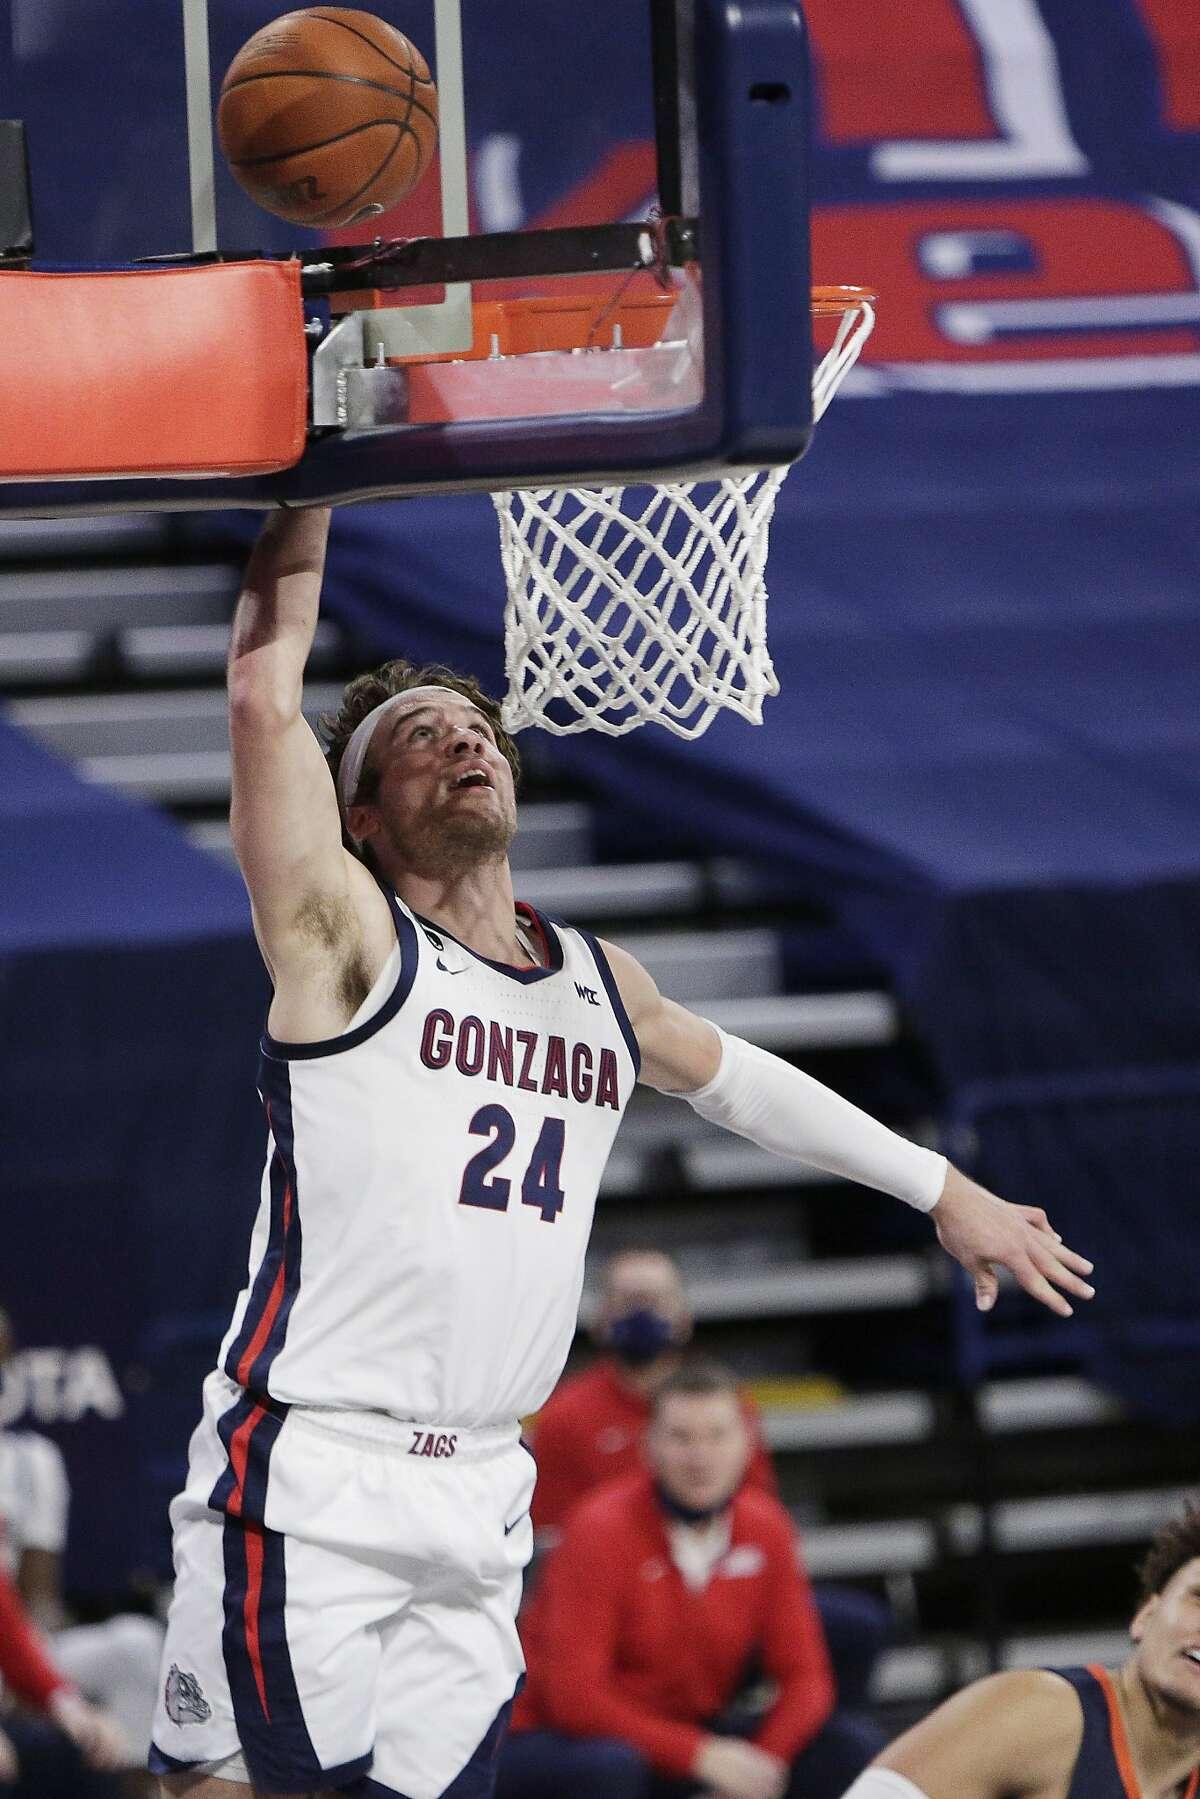 Gonzaga forward Corey Kispert shoots during the second half of the team's NCAA college basketball game against Pepperdine in Spokane, Wash., Thursday, Jan. 14, 2021. Gonzaga won 95-70. (AP Photo/Young Kwak)